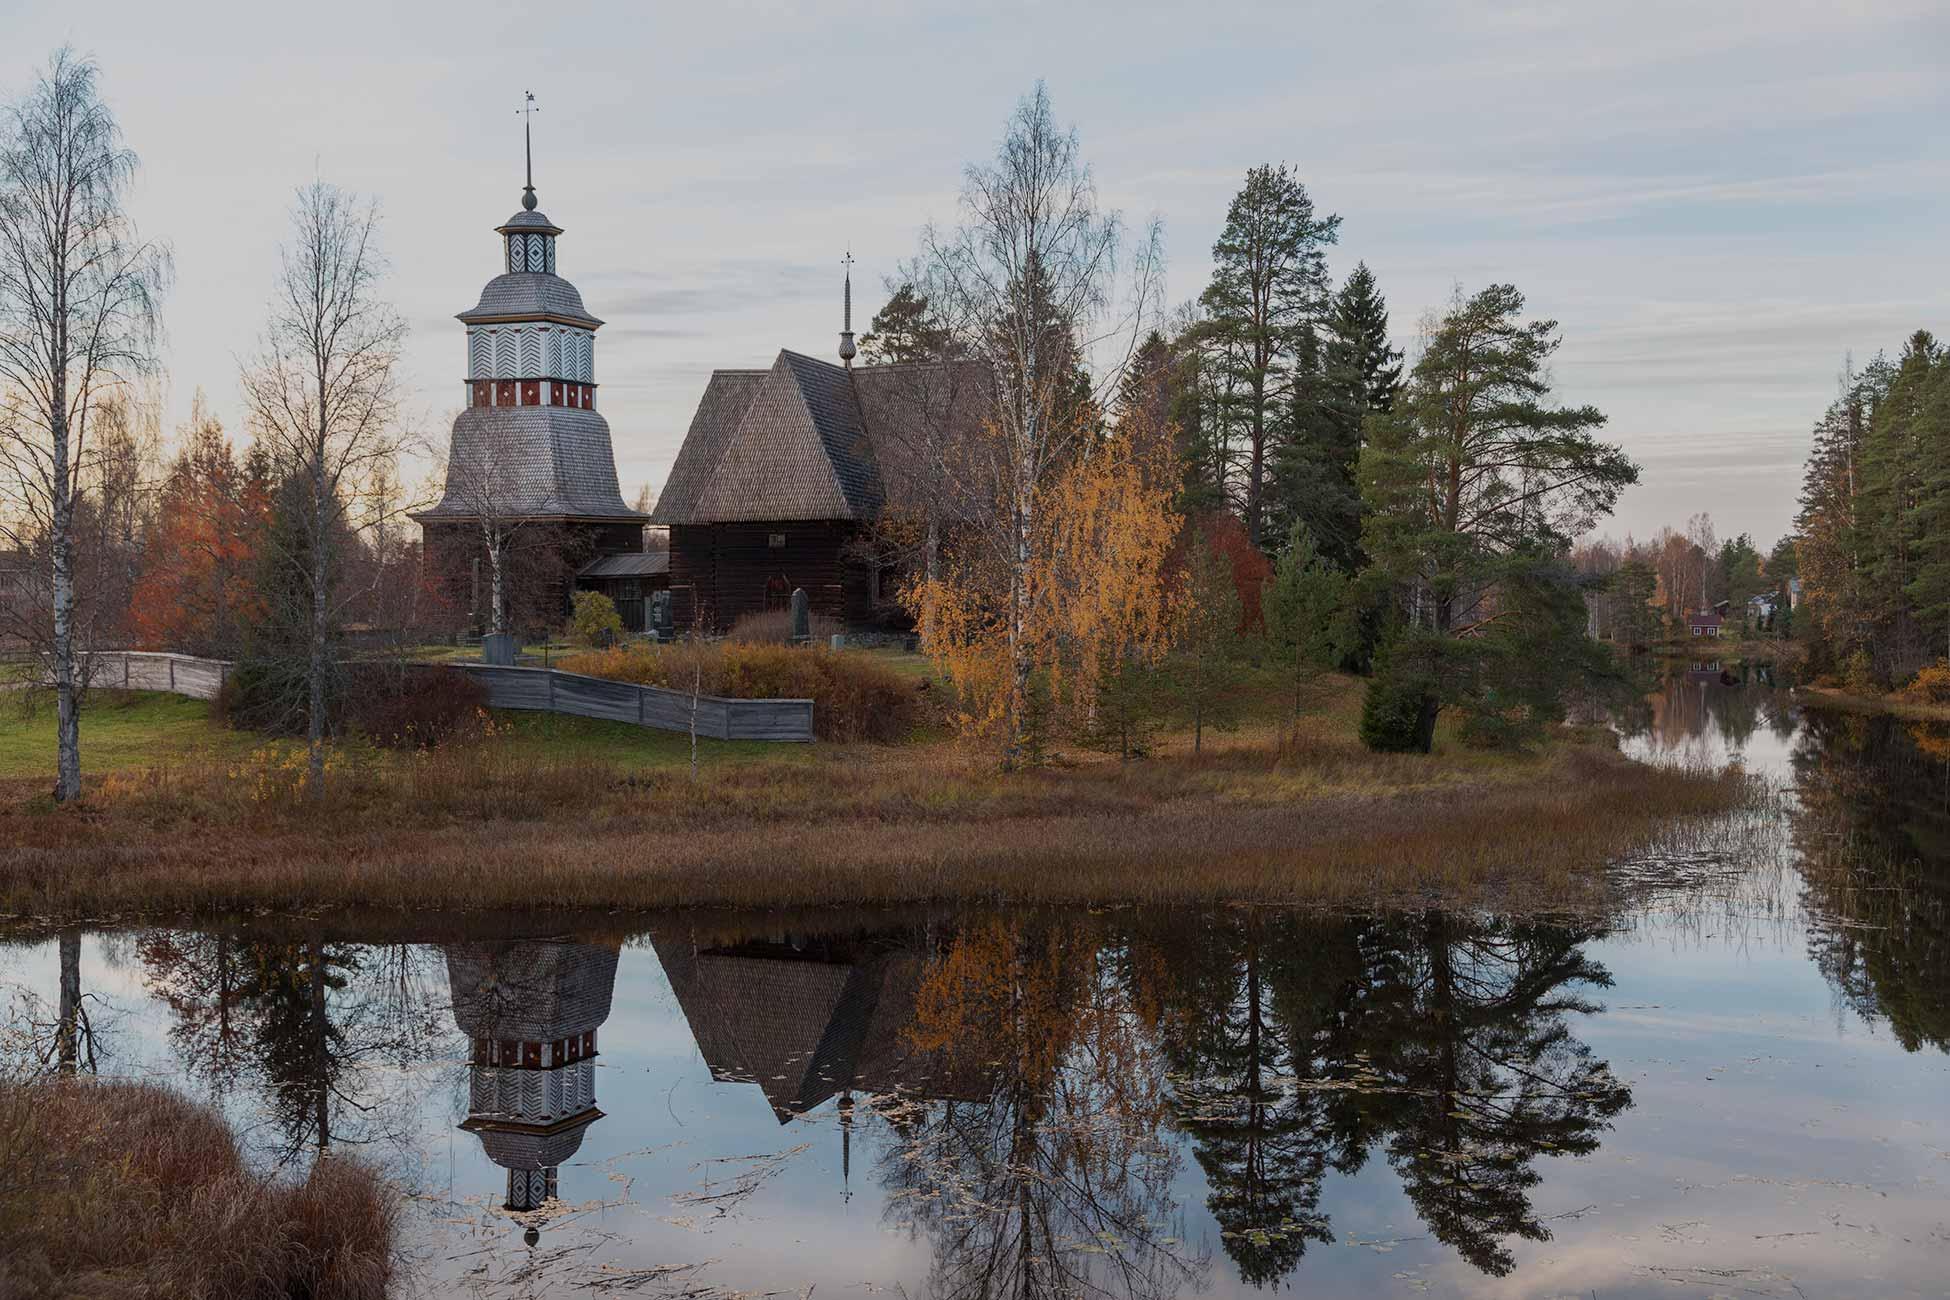 petäjäveden-vanha-kirkko-unesco